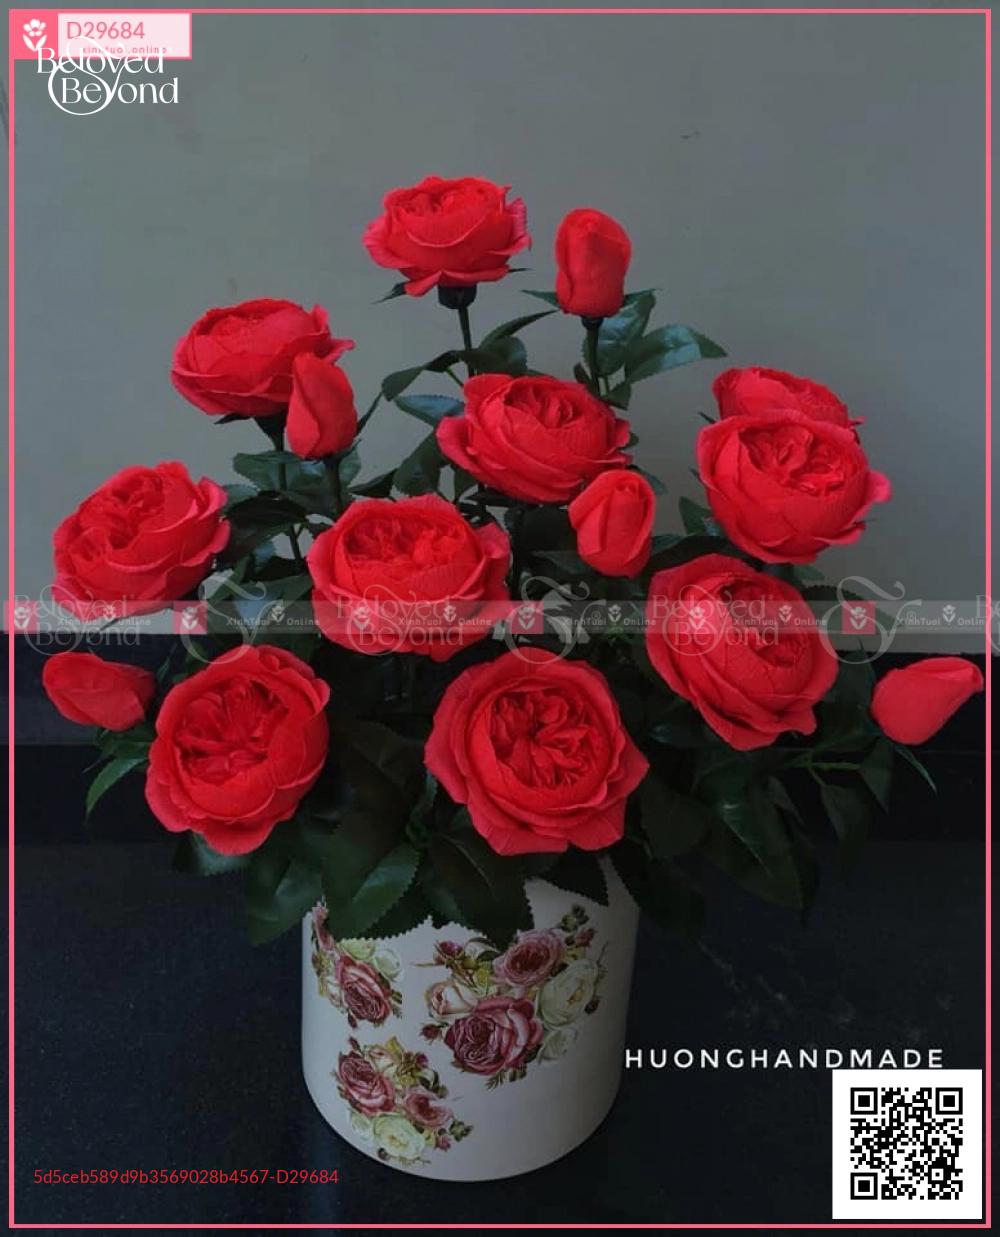 Dịu dàng - D29684 - xinhtuoi.online